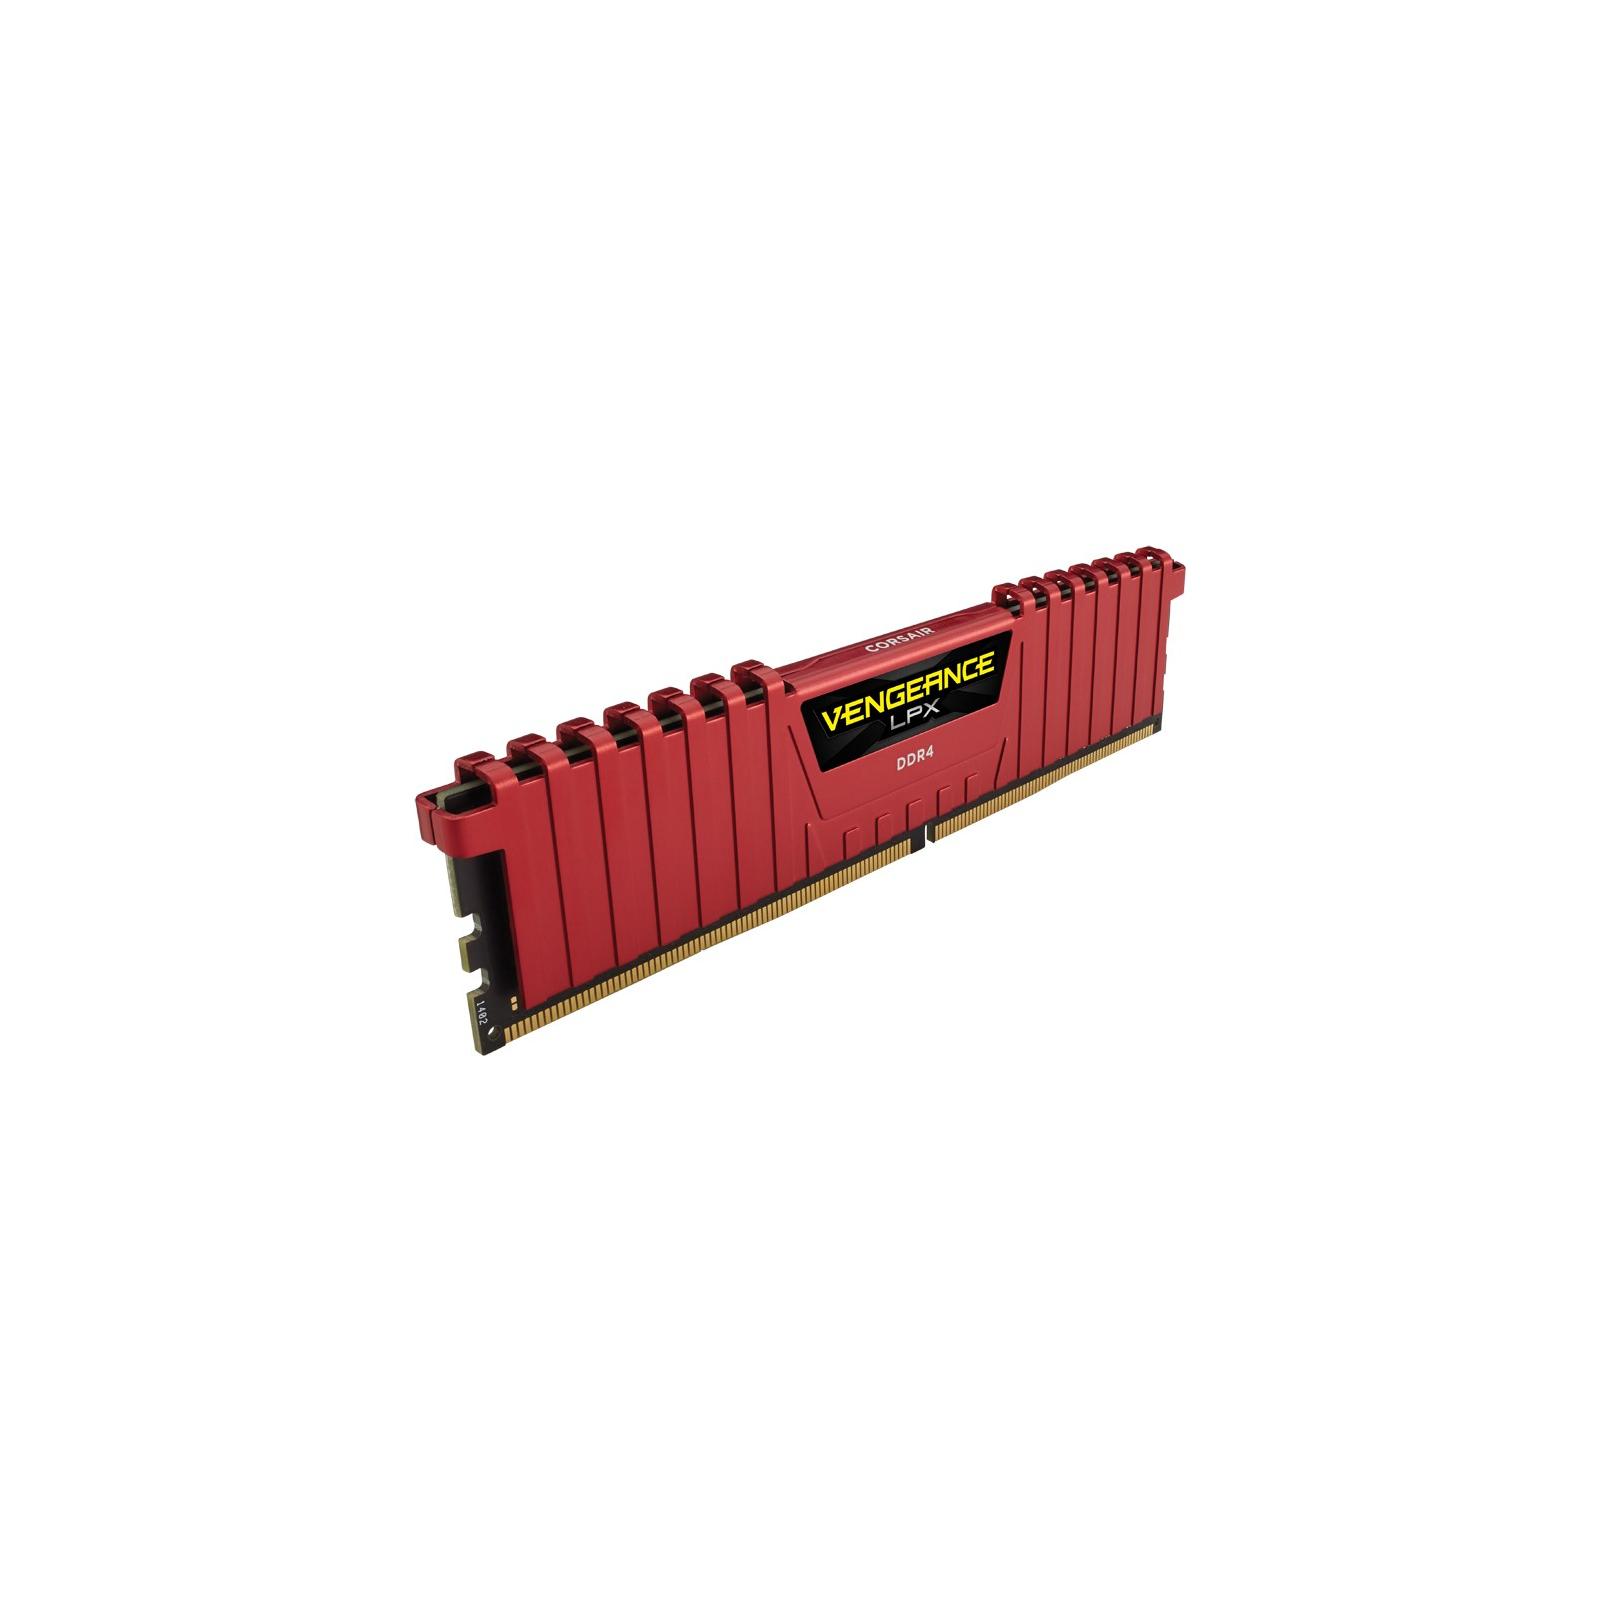 Модуль памяти для компьютера DDR4 4GB 2400 MHz Vengeance LPX Red CORSAIR (CMK4GX4M1A2400C14R) изображение 3